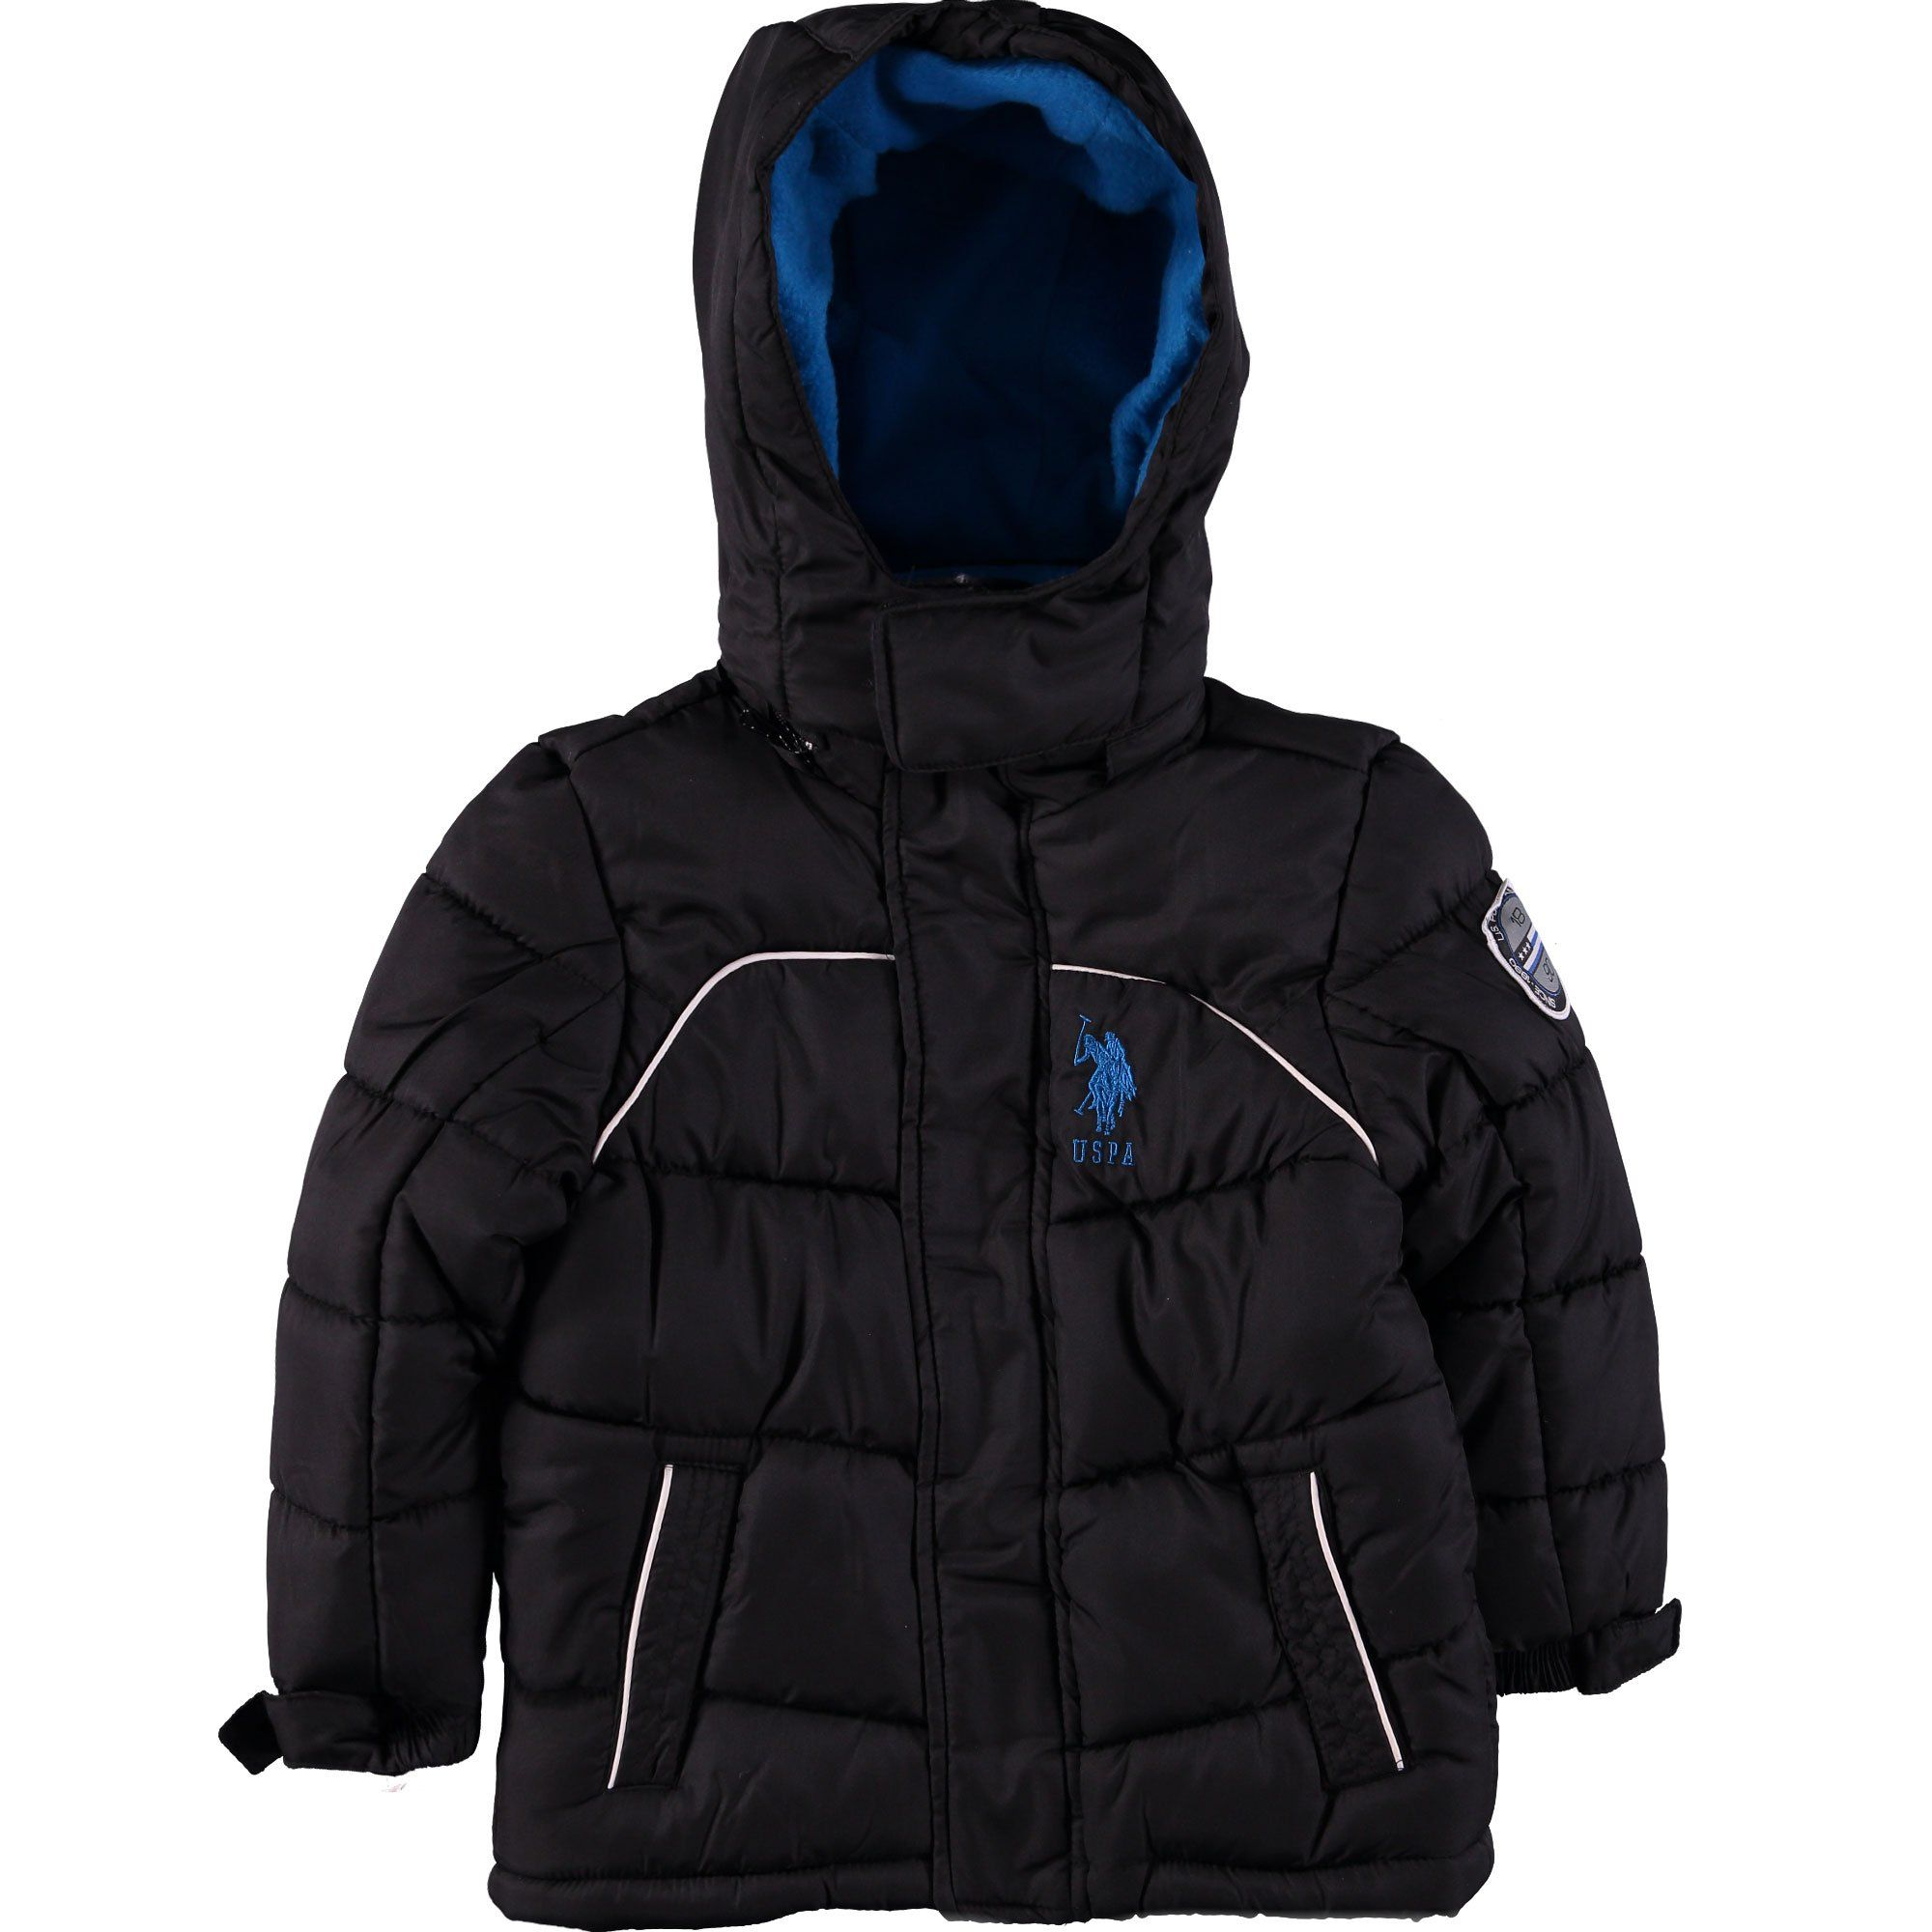 U S Polo Association Little Boys Contrast Logo Bubble Jacket 5 6 Black Removable Zipper Hood Zip Front Closur Polo Association Sweatshirts Women Jackets [ 2000 x 2000 Pixel ]